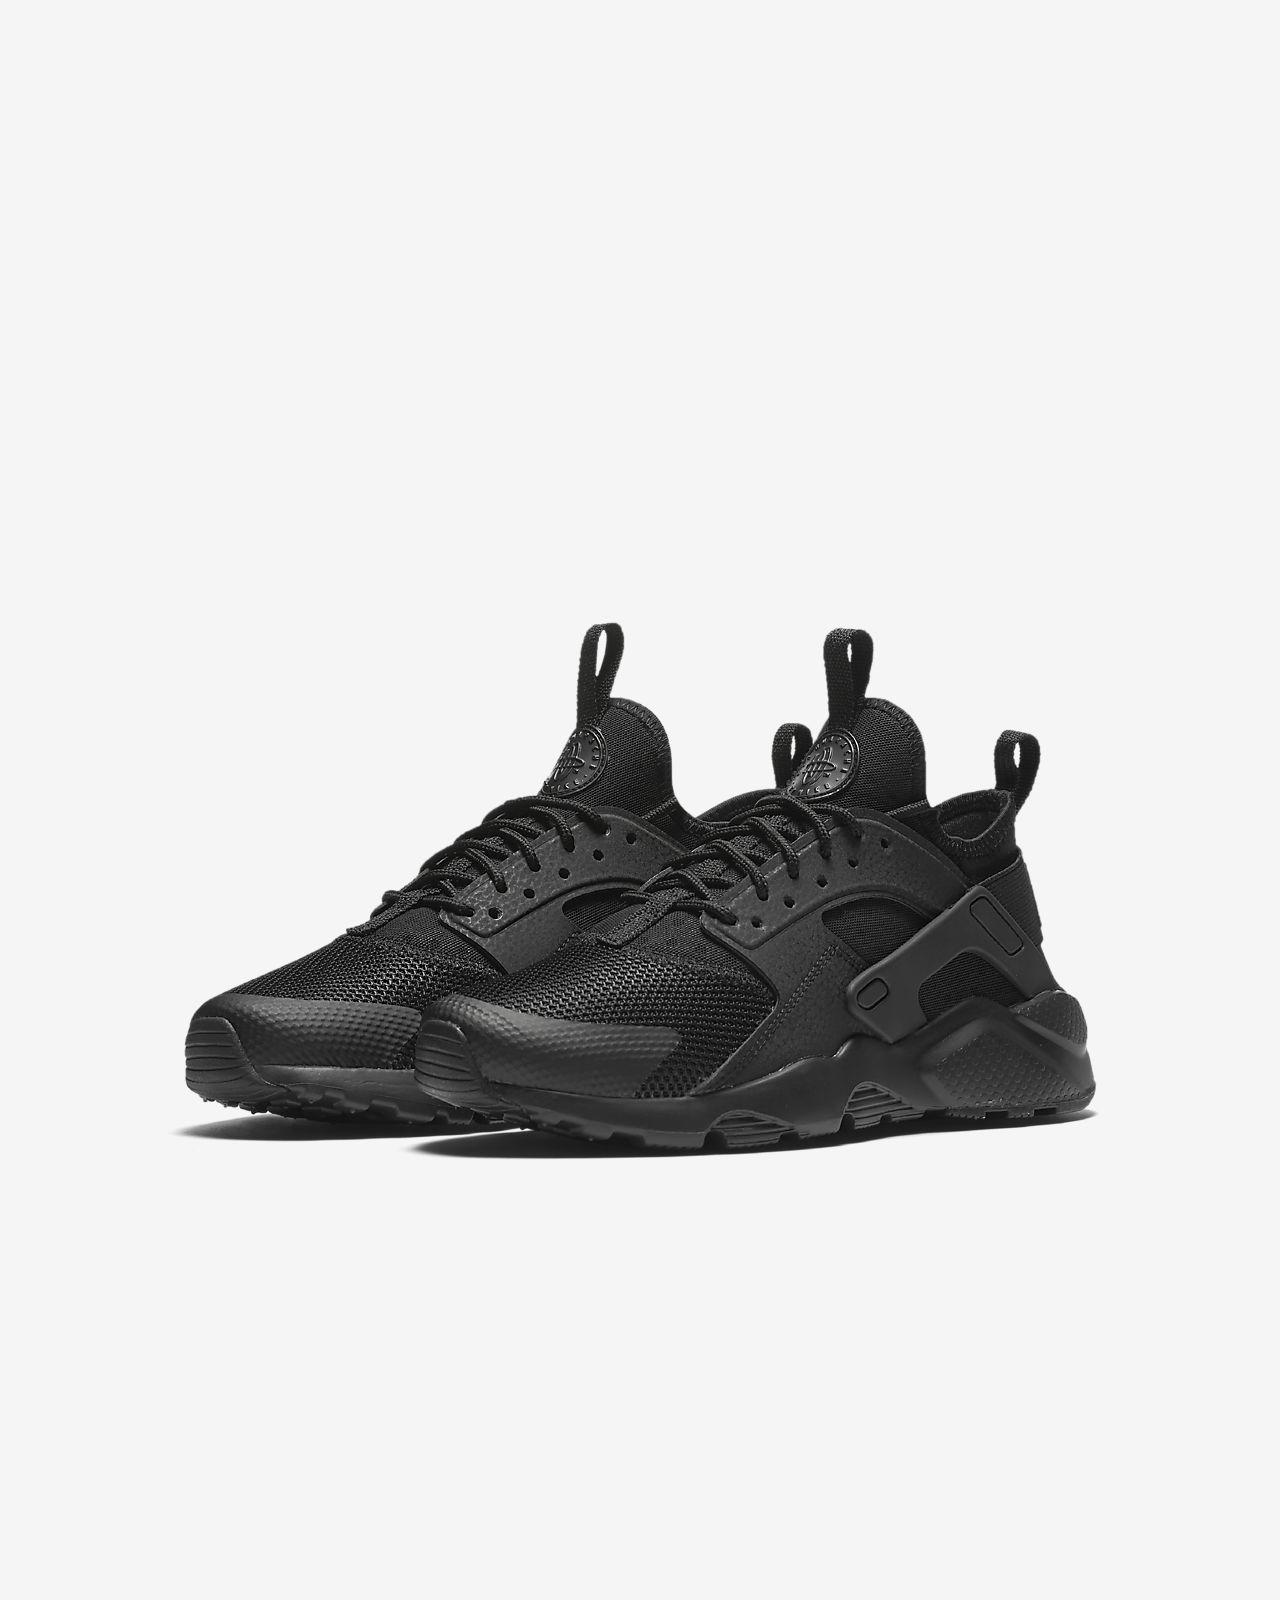 Nike Air Huarache Ultra Schuh für ältere Kinder. Nike LU